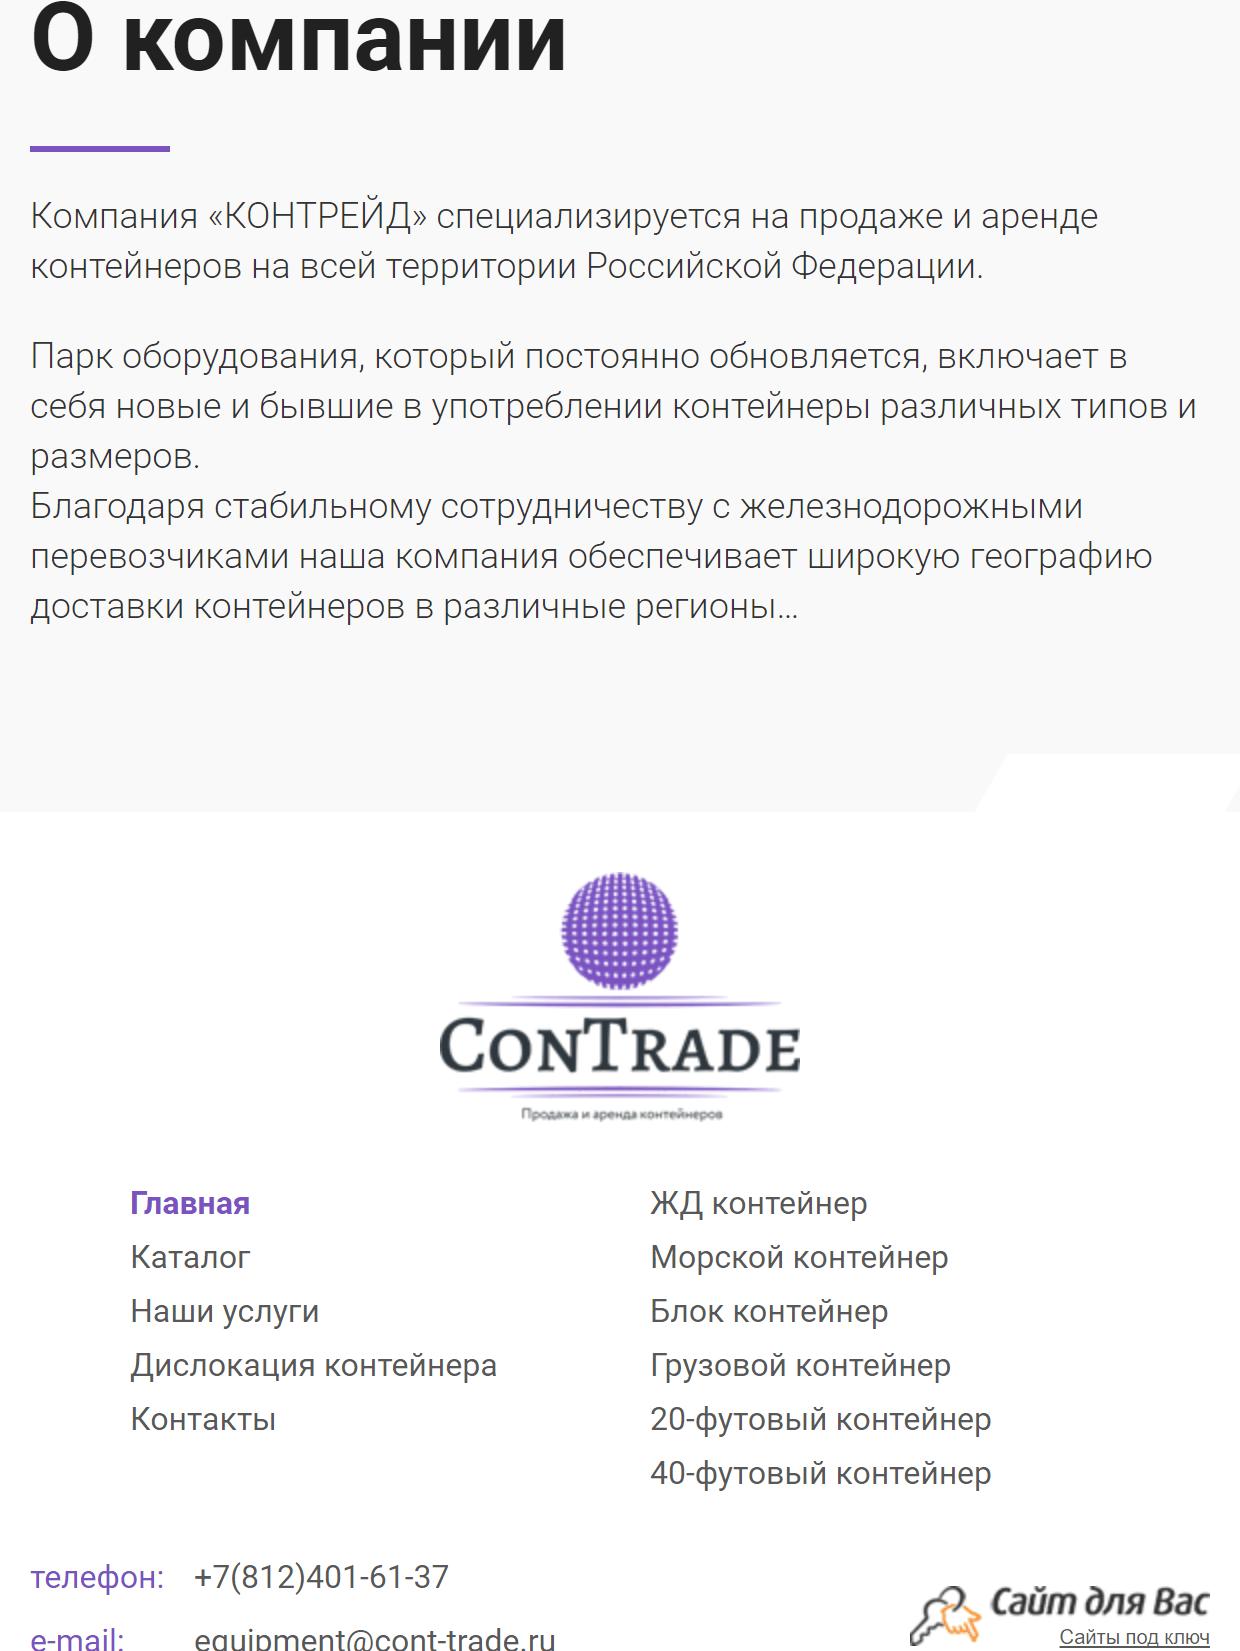 планшетная версия сайта http://cont-trade.ru/